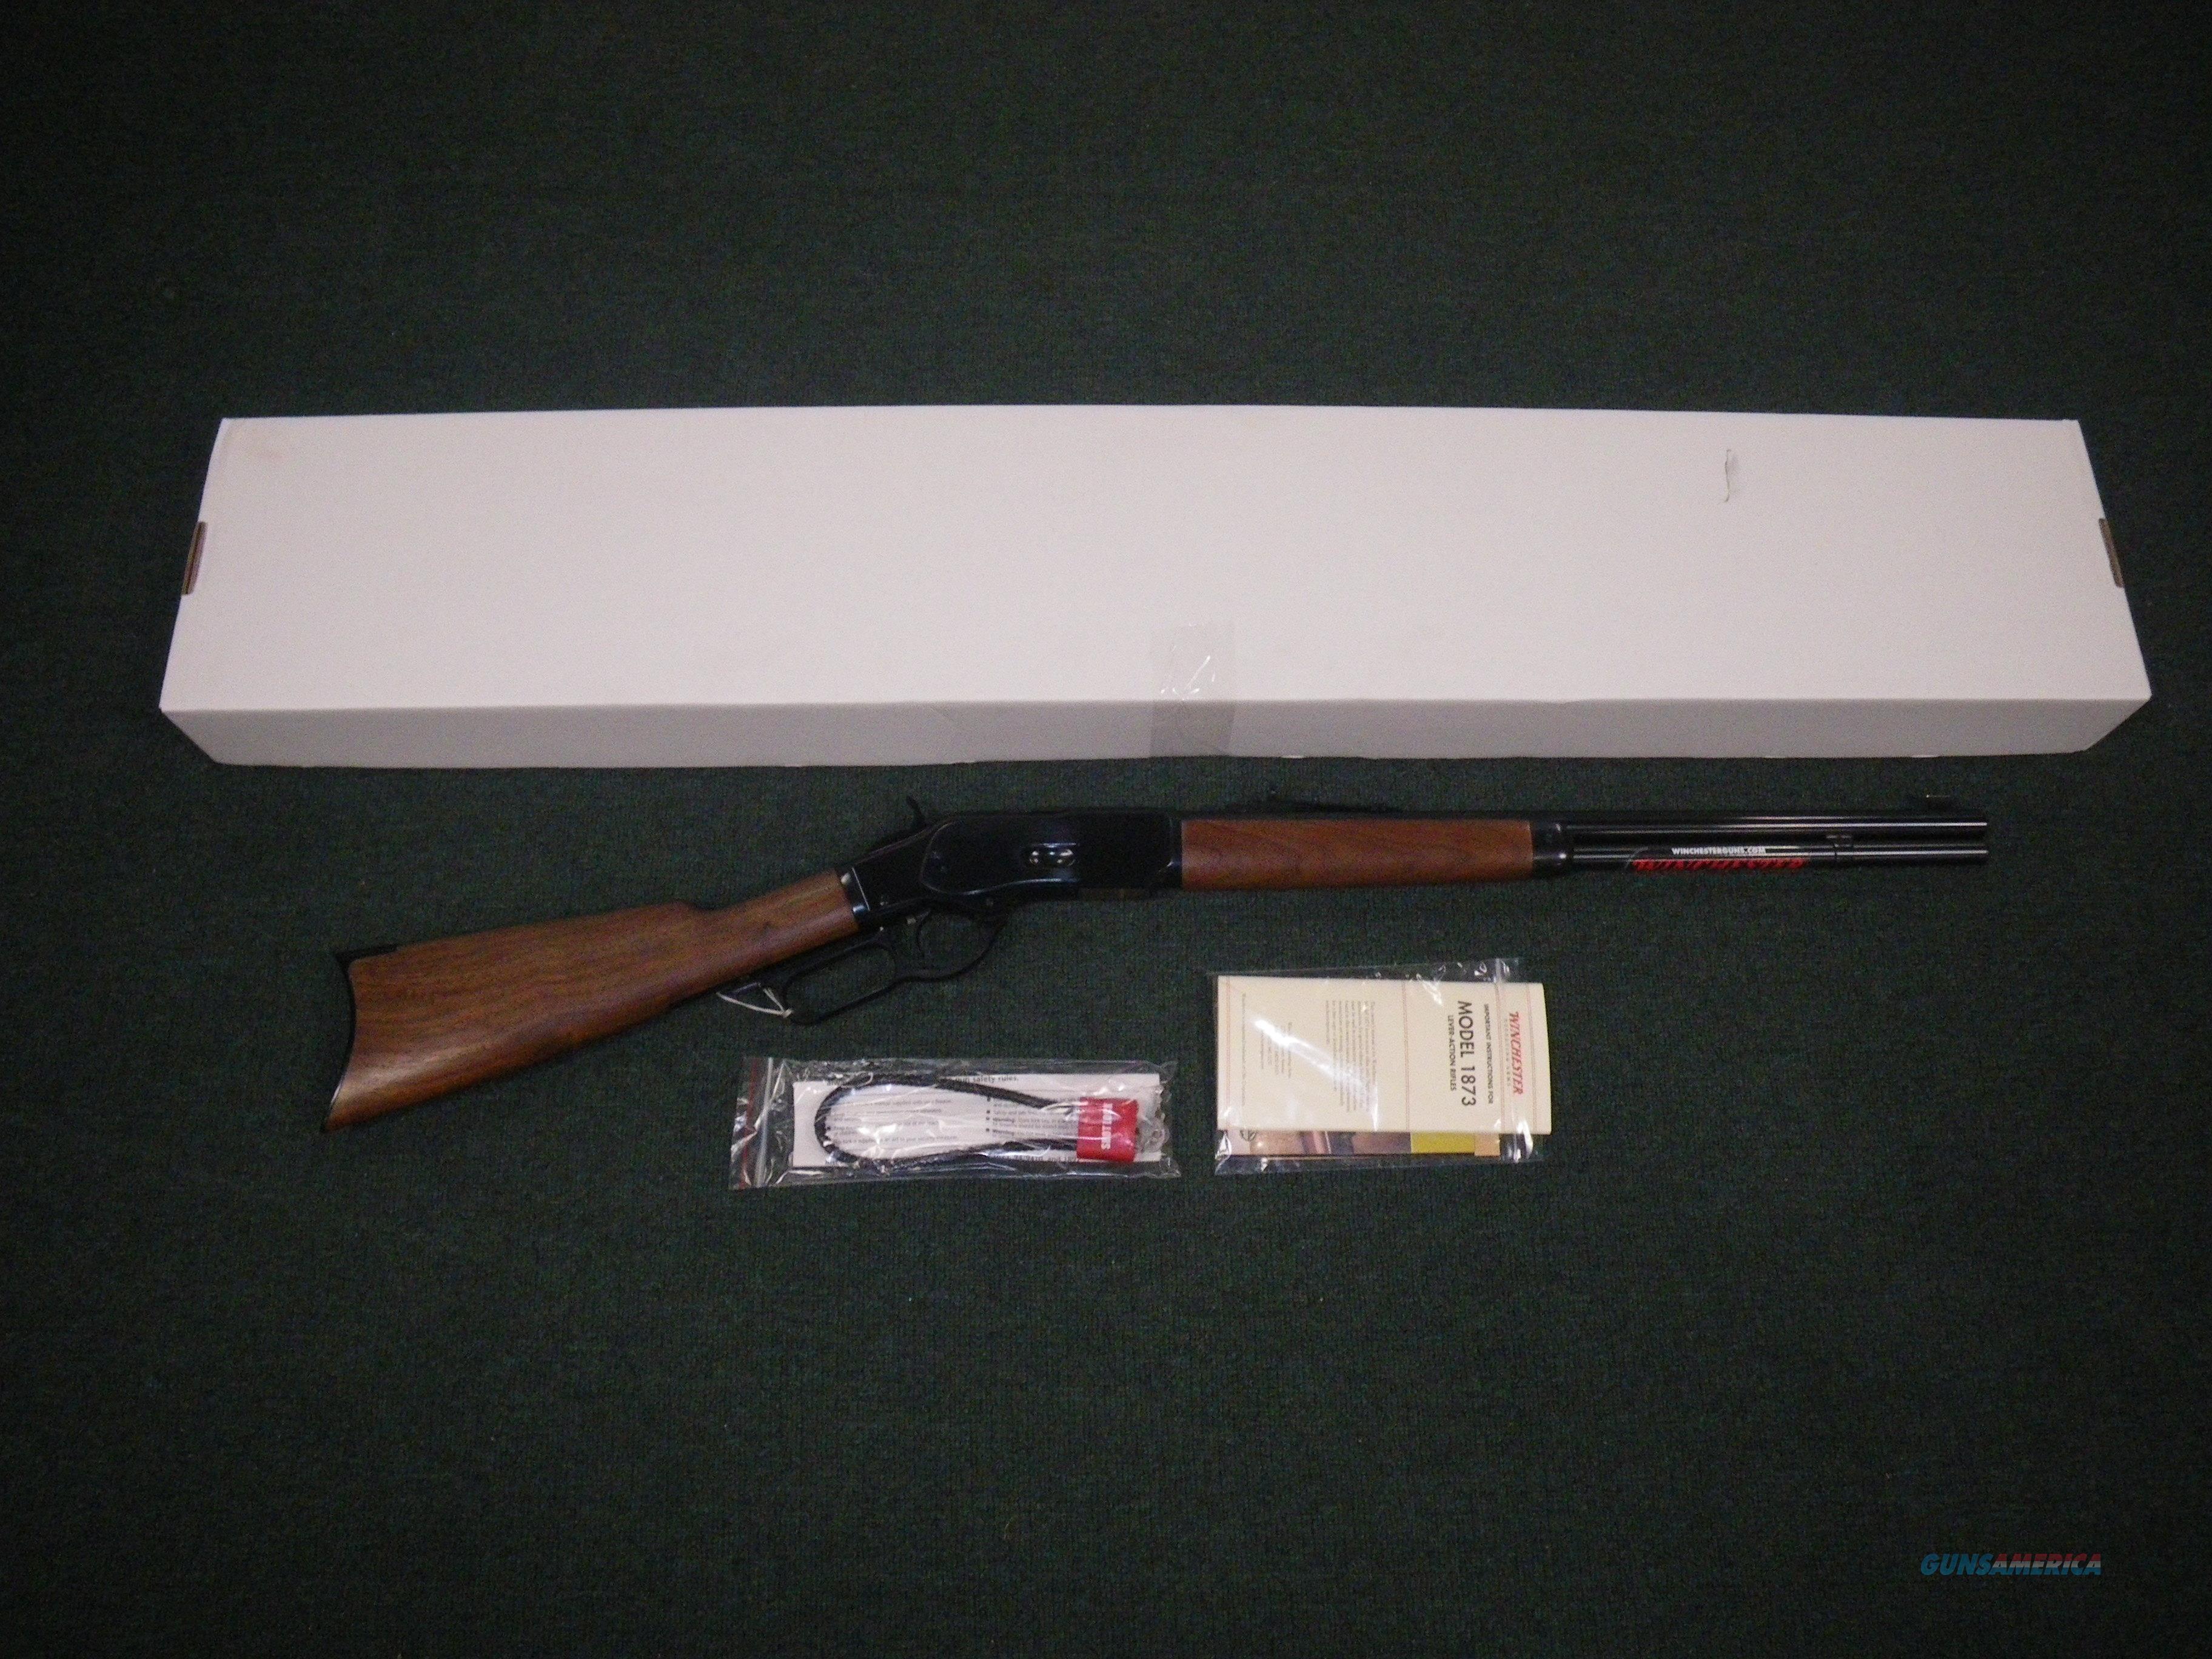 "Winchester Model 73 Short Rifle 44-40 Win 20"" NEW #534200140  Guns > Rifles > Winchester Rifles - Modern Lever > Other Lever > Post-64"